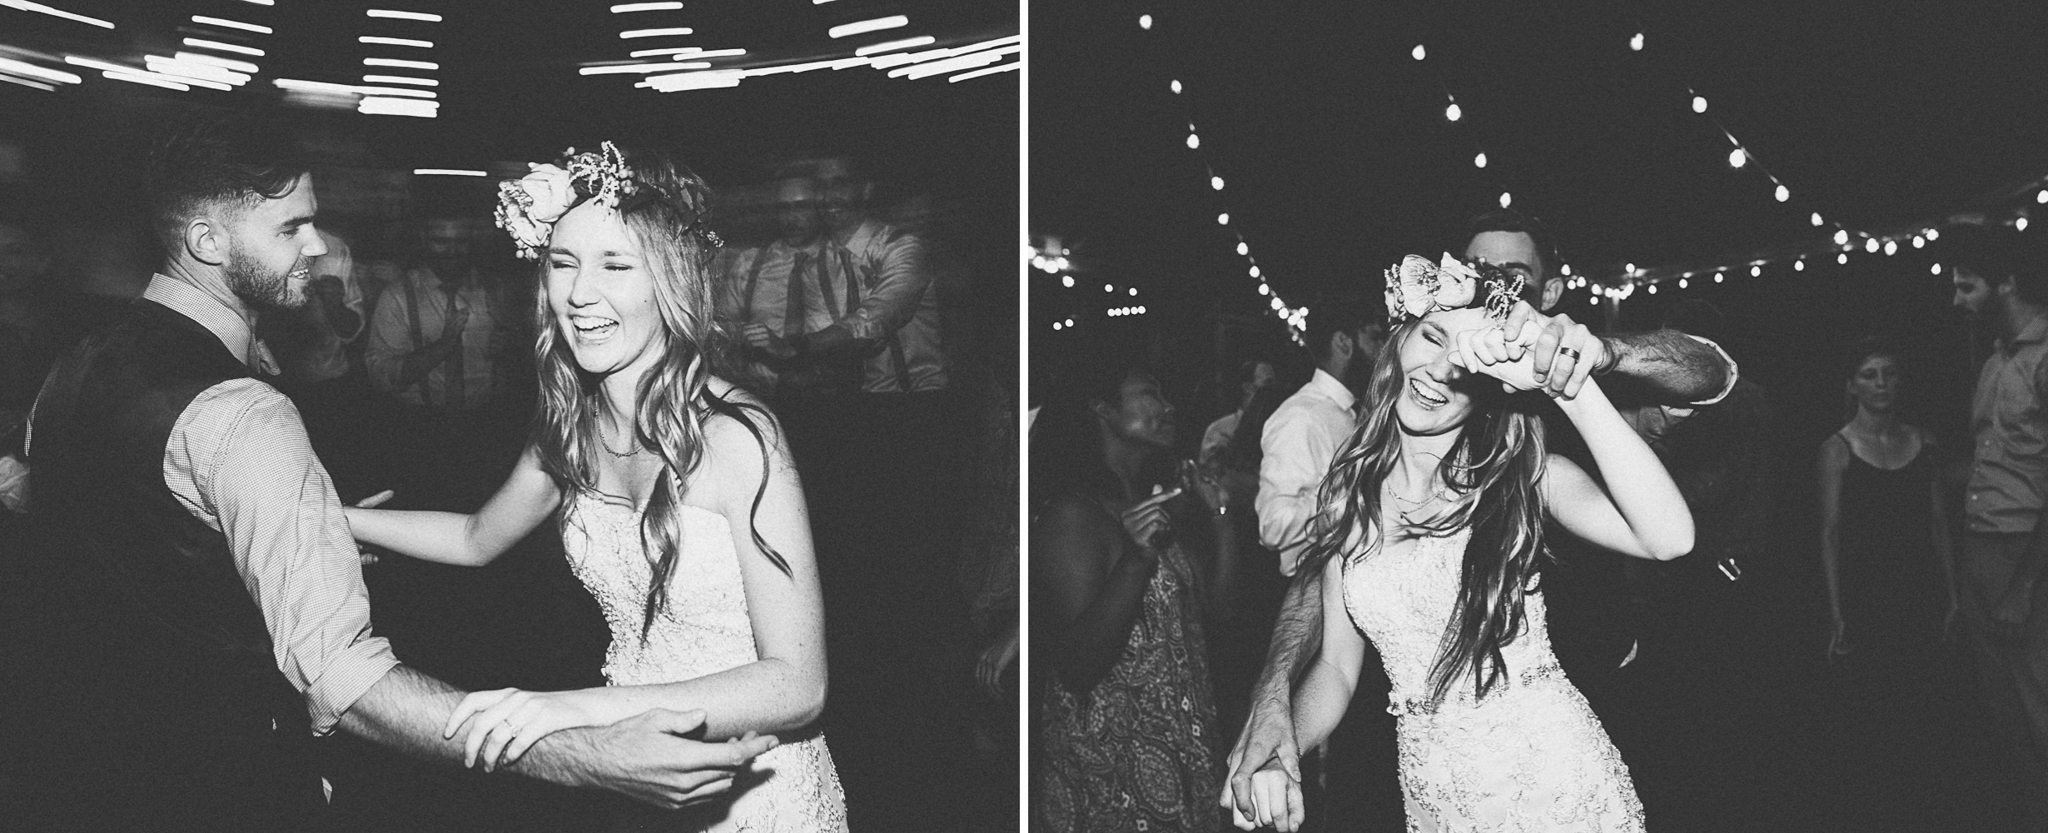 ©Isaiah & Taylor Photography - Pine Rose Cabin - Lake Arrowhead - Los Angeles Wedding Photographer-138.jpg